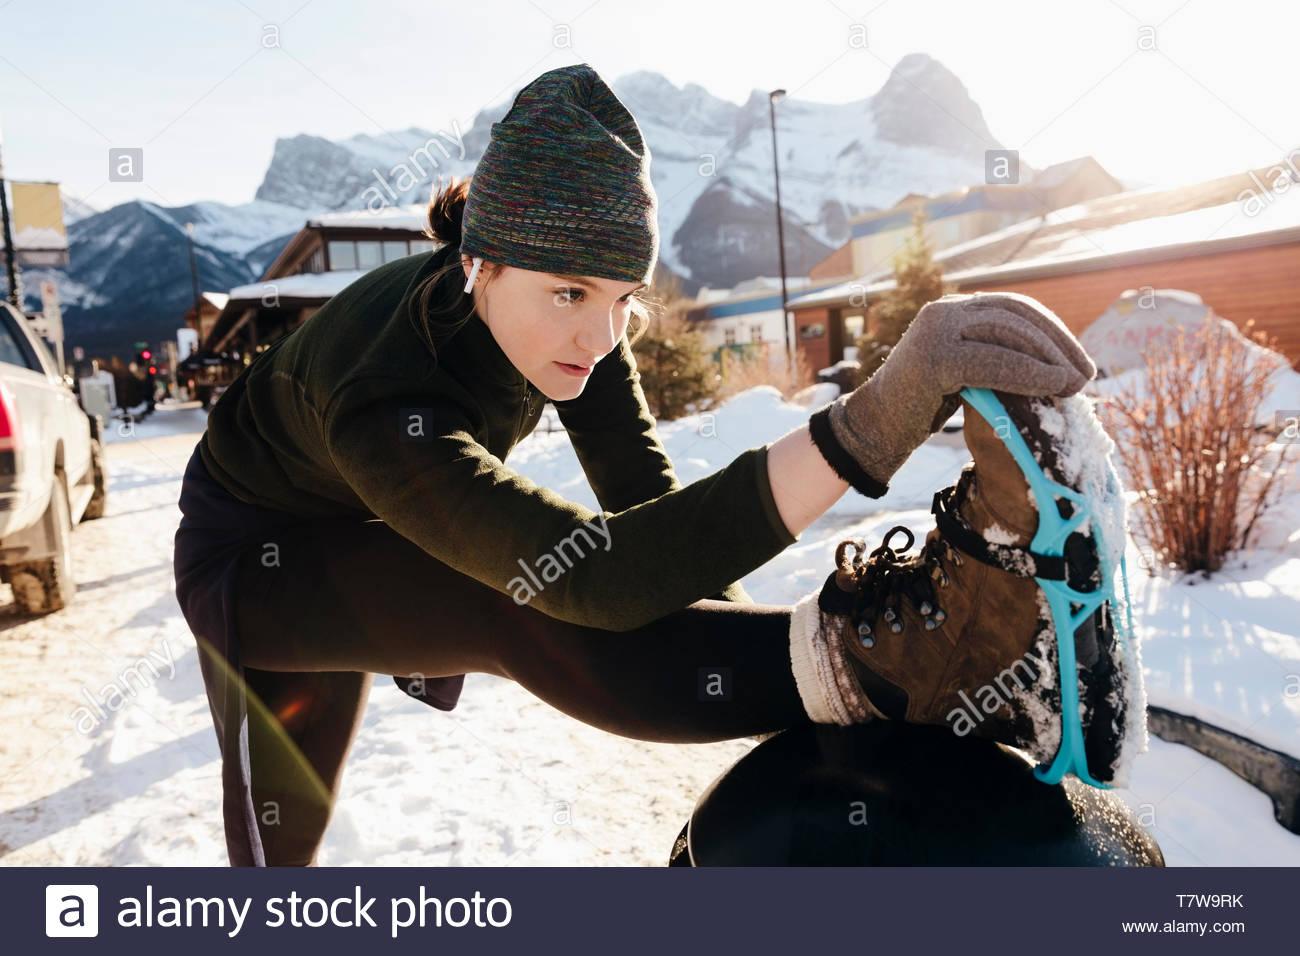 L'accent adolescente runner stretching leg sur trottoir enneigé Photo Stock